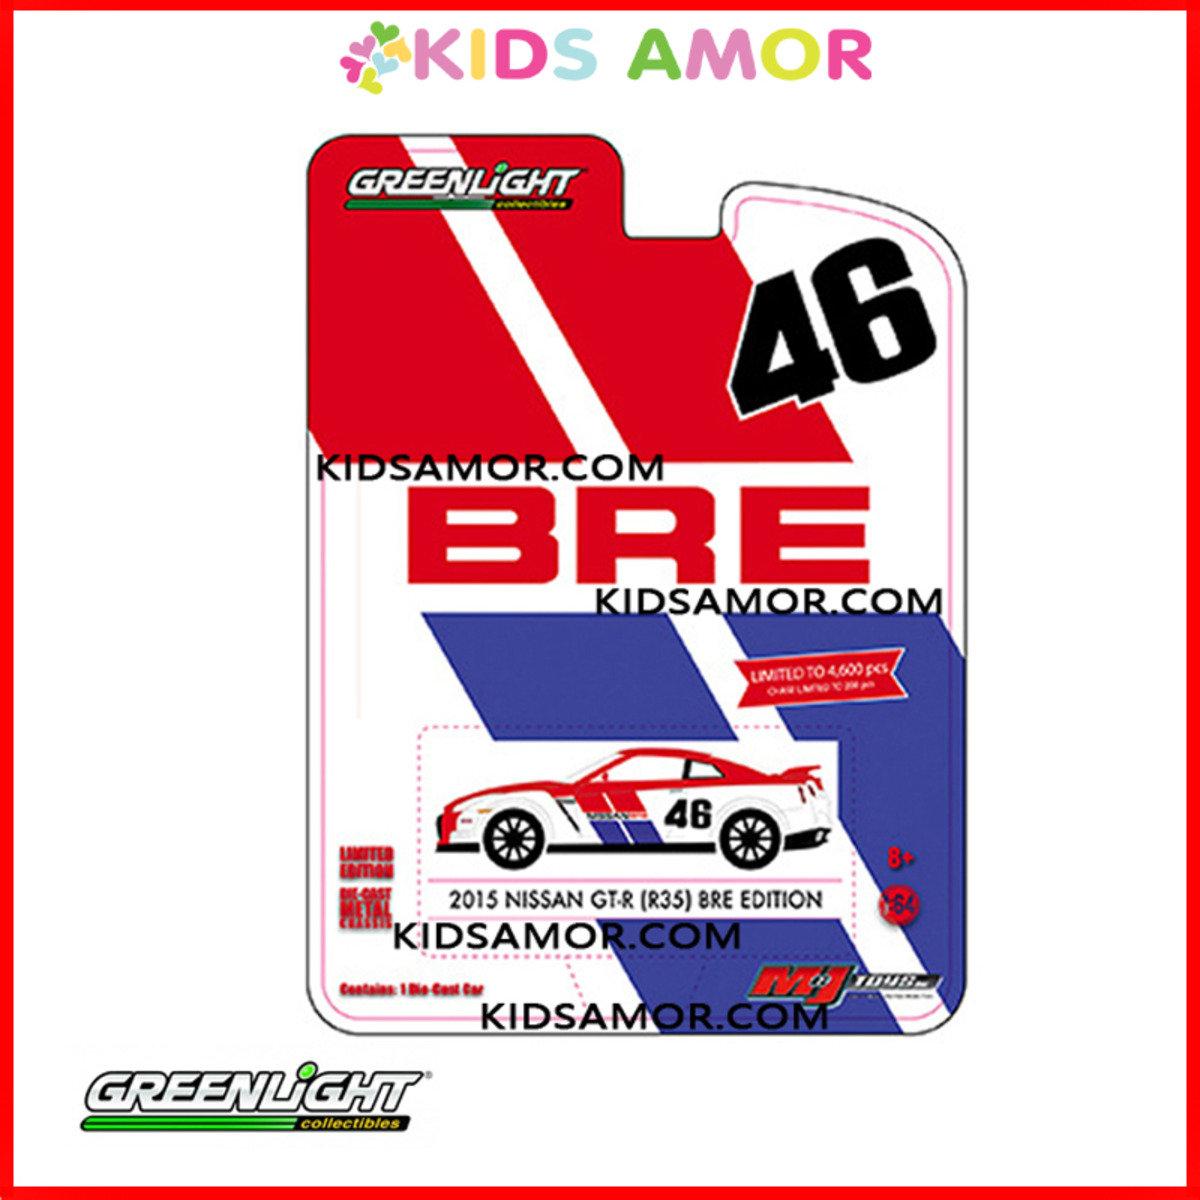 (有貨通知我) 綠光 GREENLIGHT 限量 MJ EXCLUSIVE: 1/64 日產 GT-R (R35) BRE EDITION